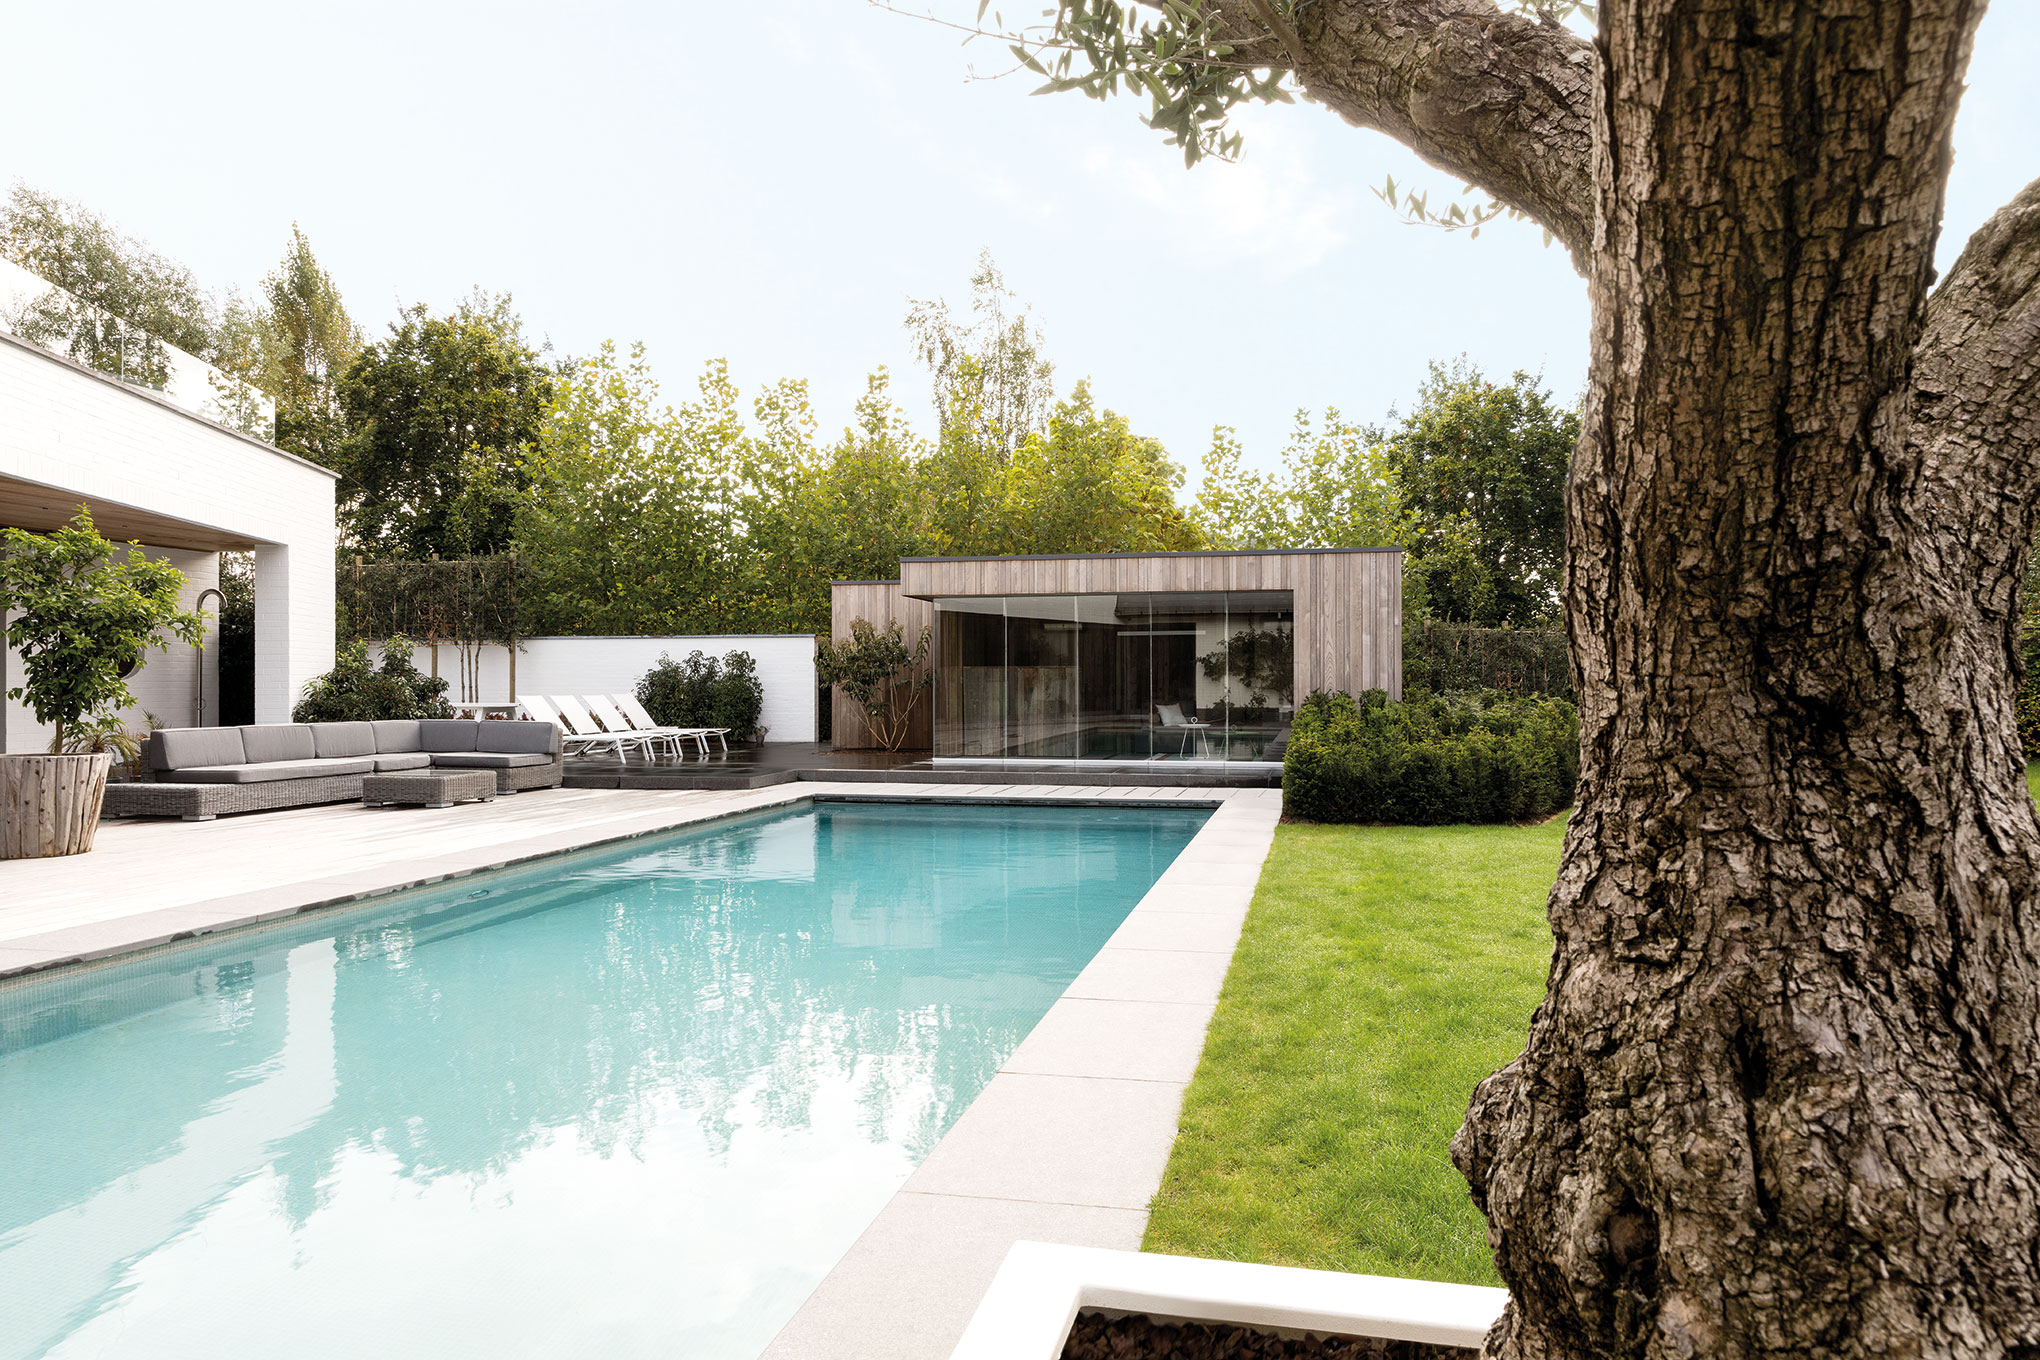 moderne poolhouse in hotwood essen te zwijnaarde livinlodge. Black Bedroom Furniture Sets. Home Design Ideas